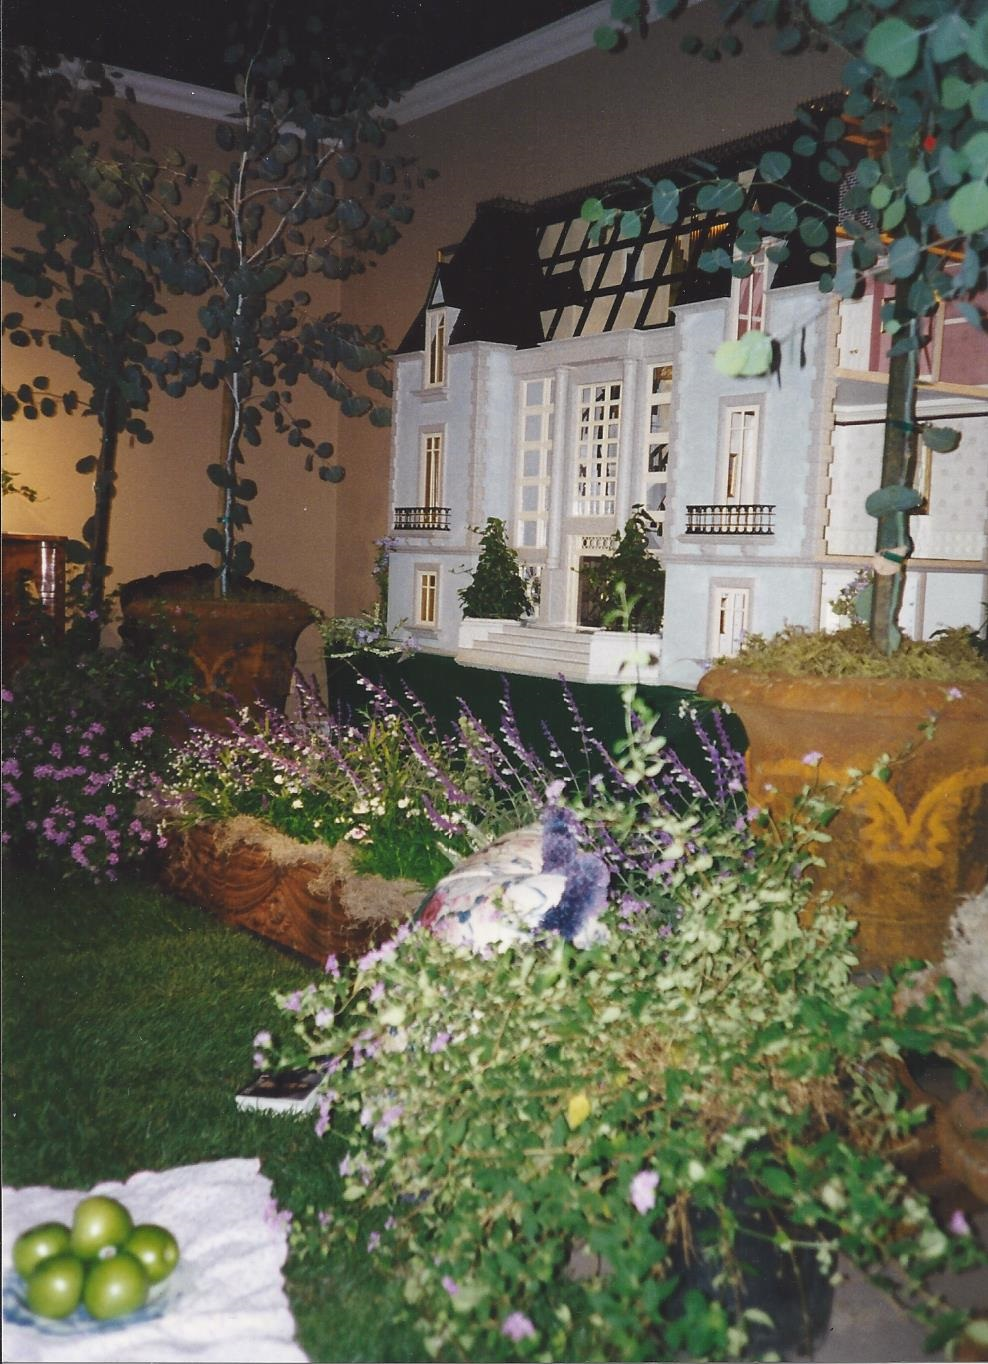 Chateau du Bois Garden Setting